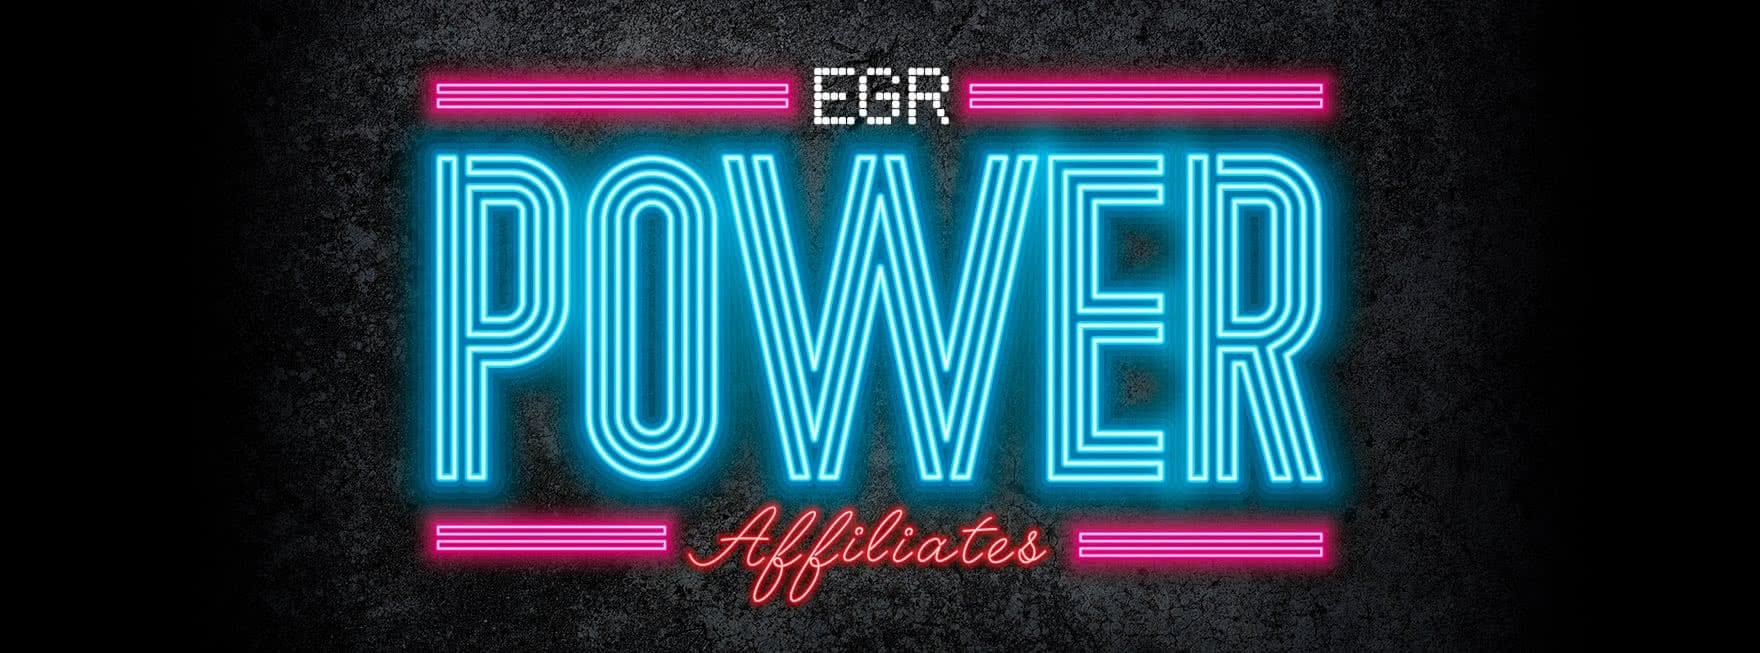 TrafficLab News - Traffic Lab ranks 17th on the EGR Power Affiliates 2020